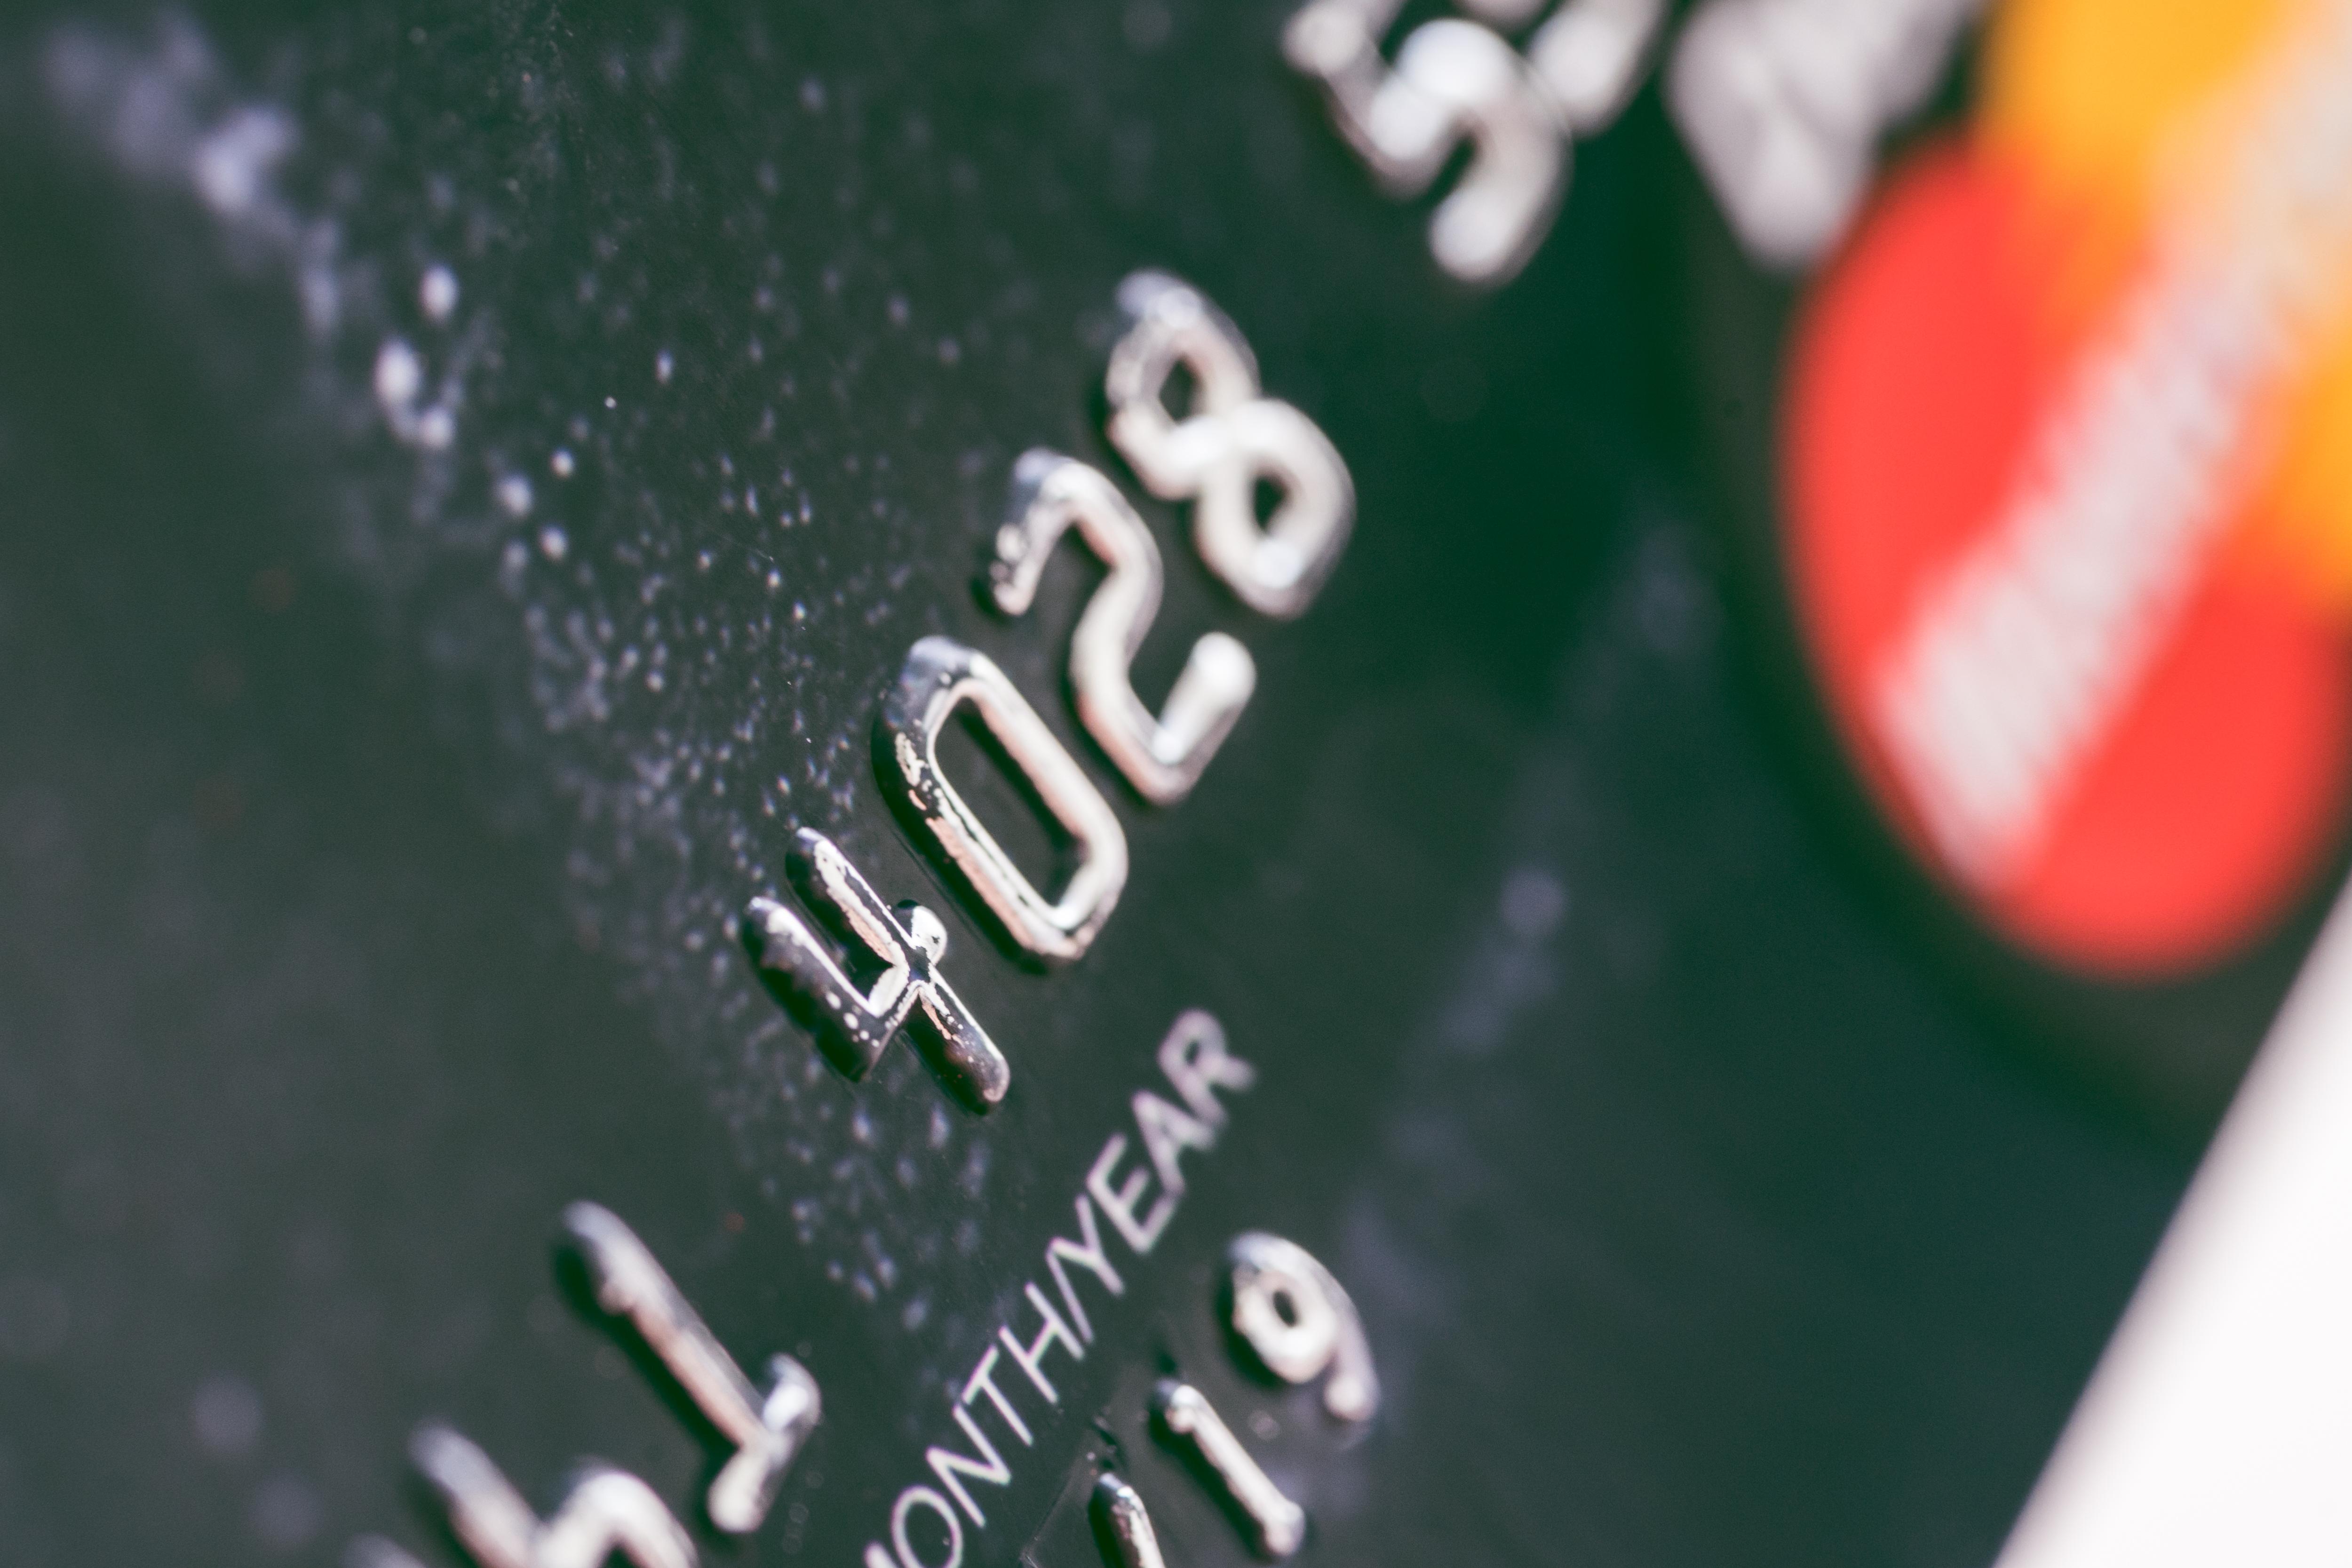 debit-card-bank-numbers-close-up-picjumbo-com Servizi